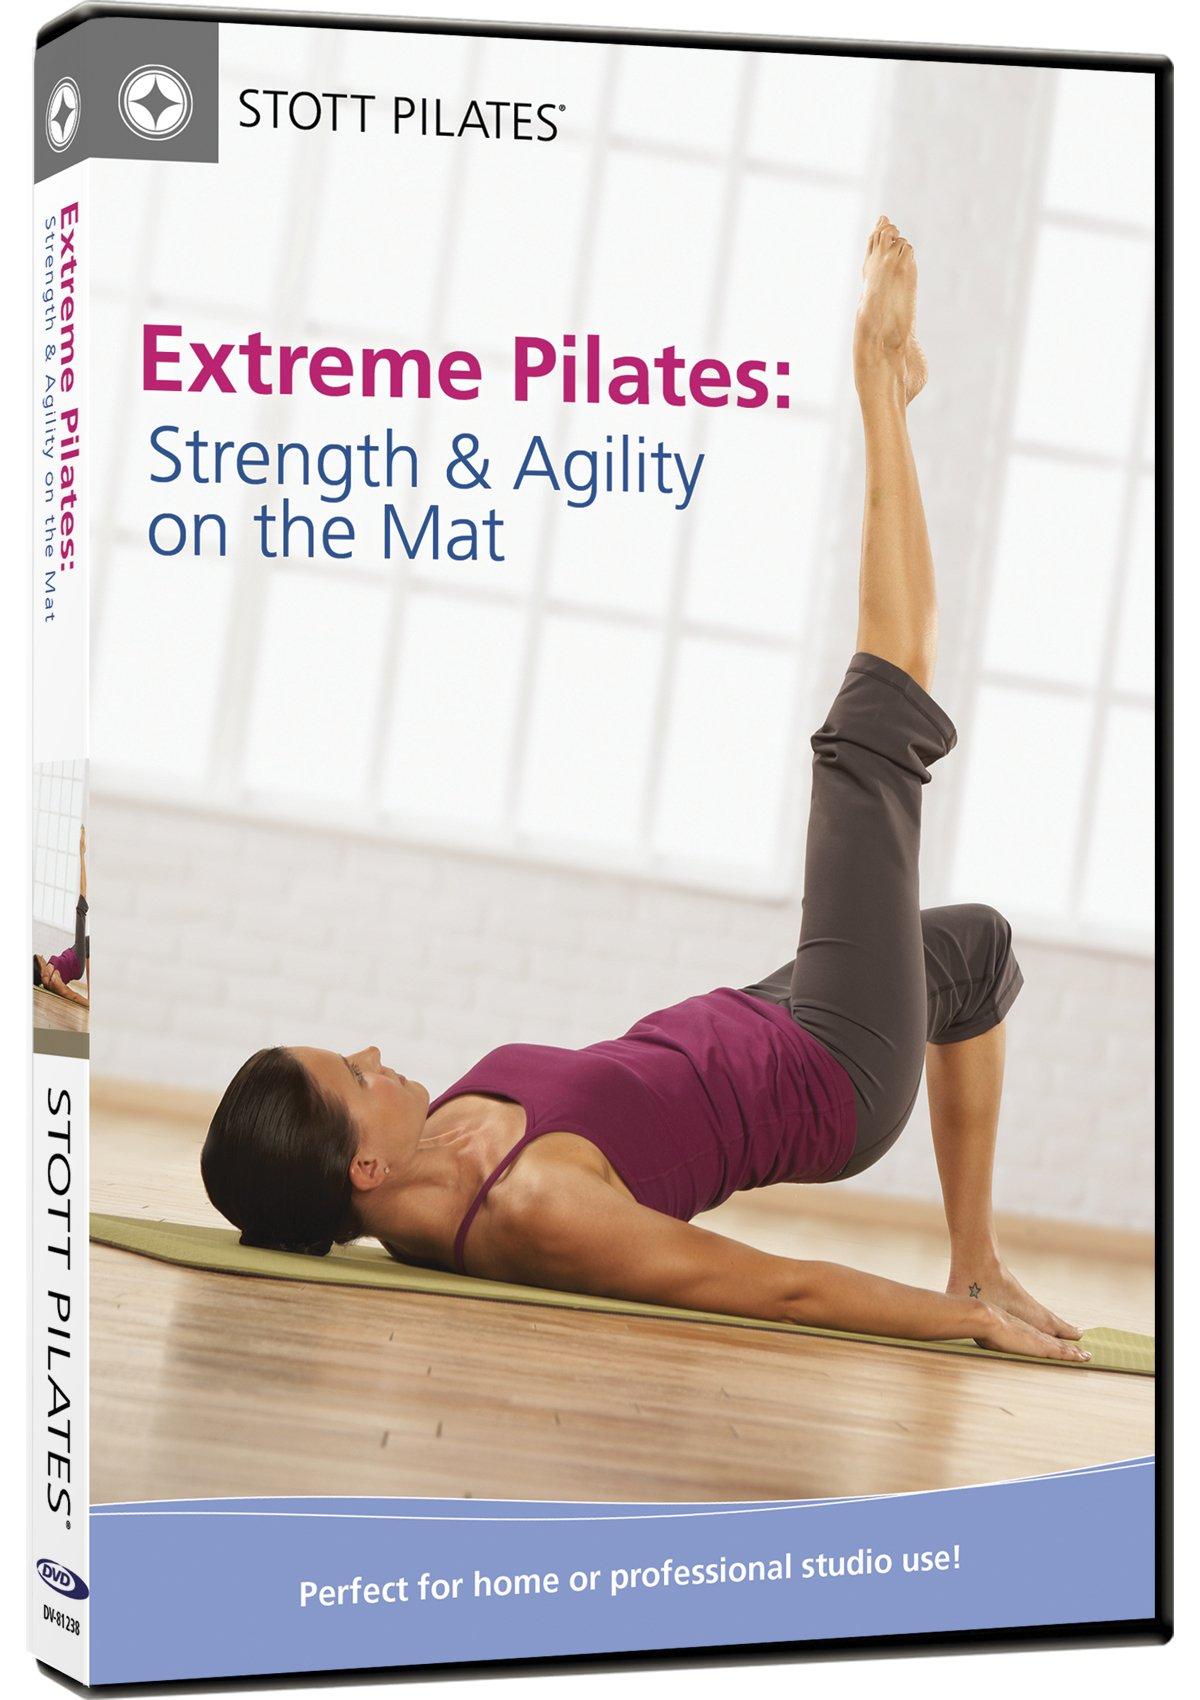 STOTT PILATES Extreme Pilates Strength